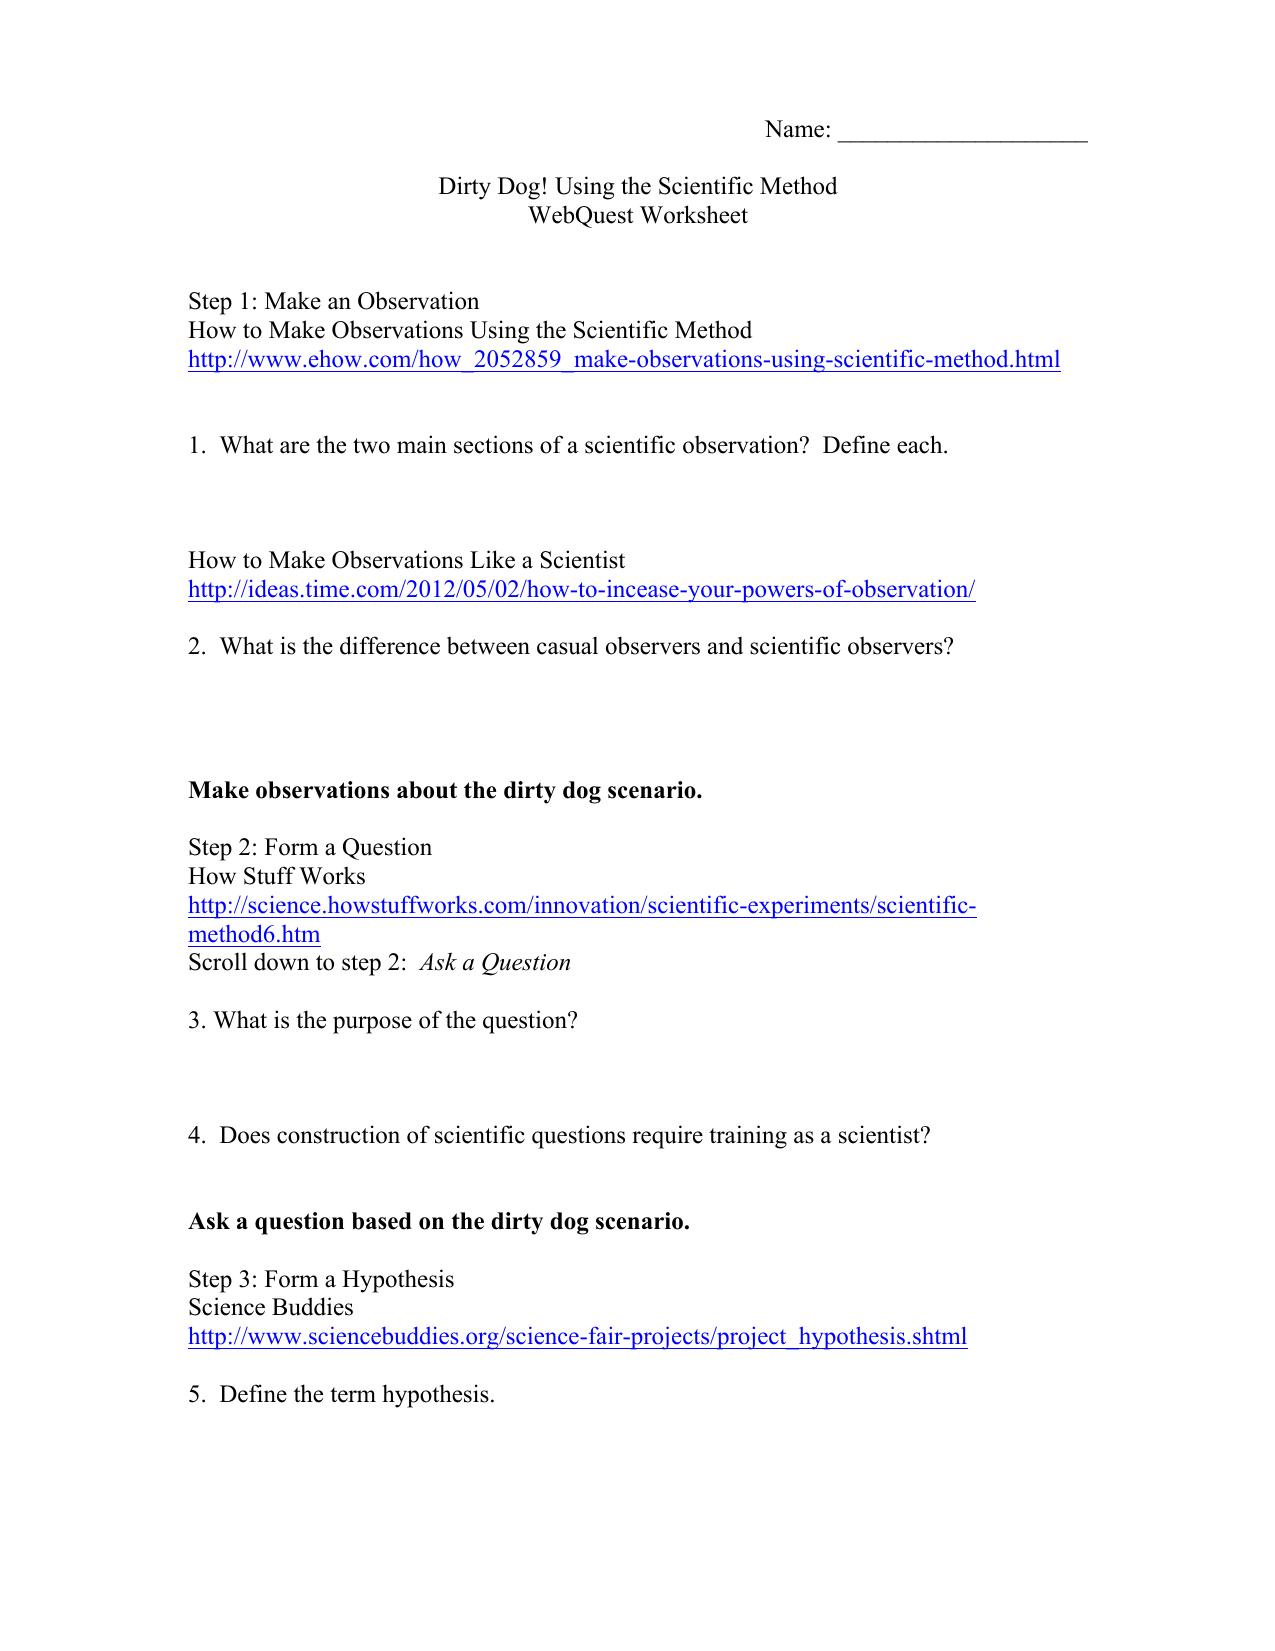 Dirty Dog Using the Scientific Method WebQuest Worksheet Step 1 – Scientific Method Scenarios Worksheet